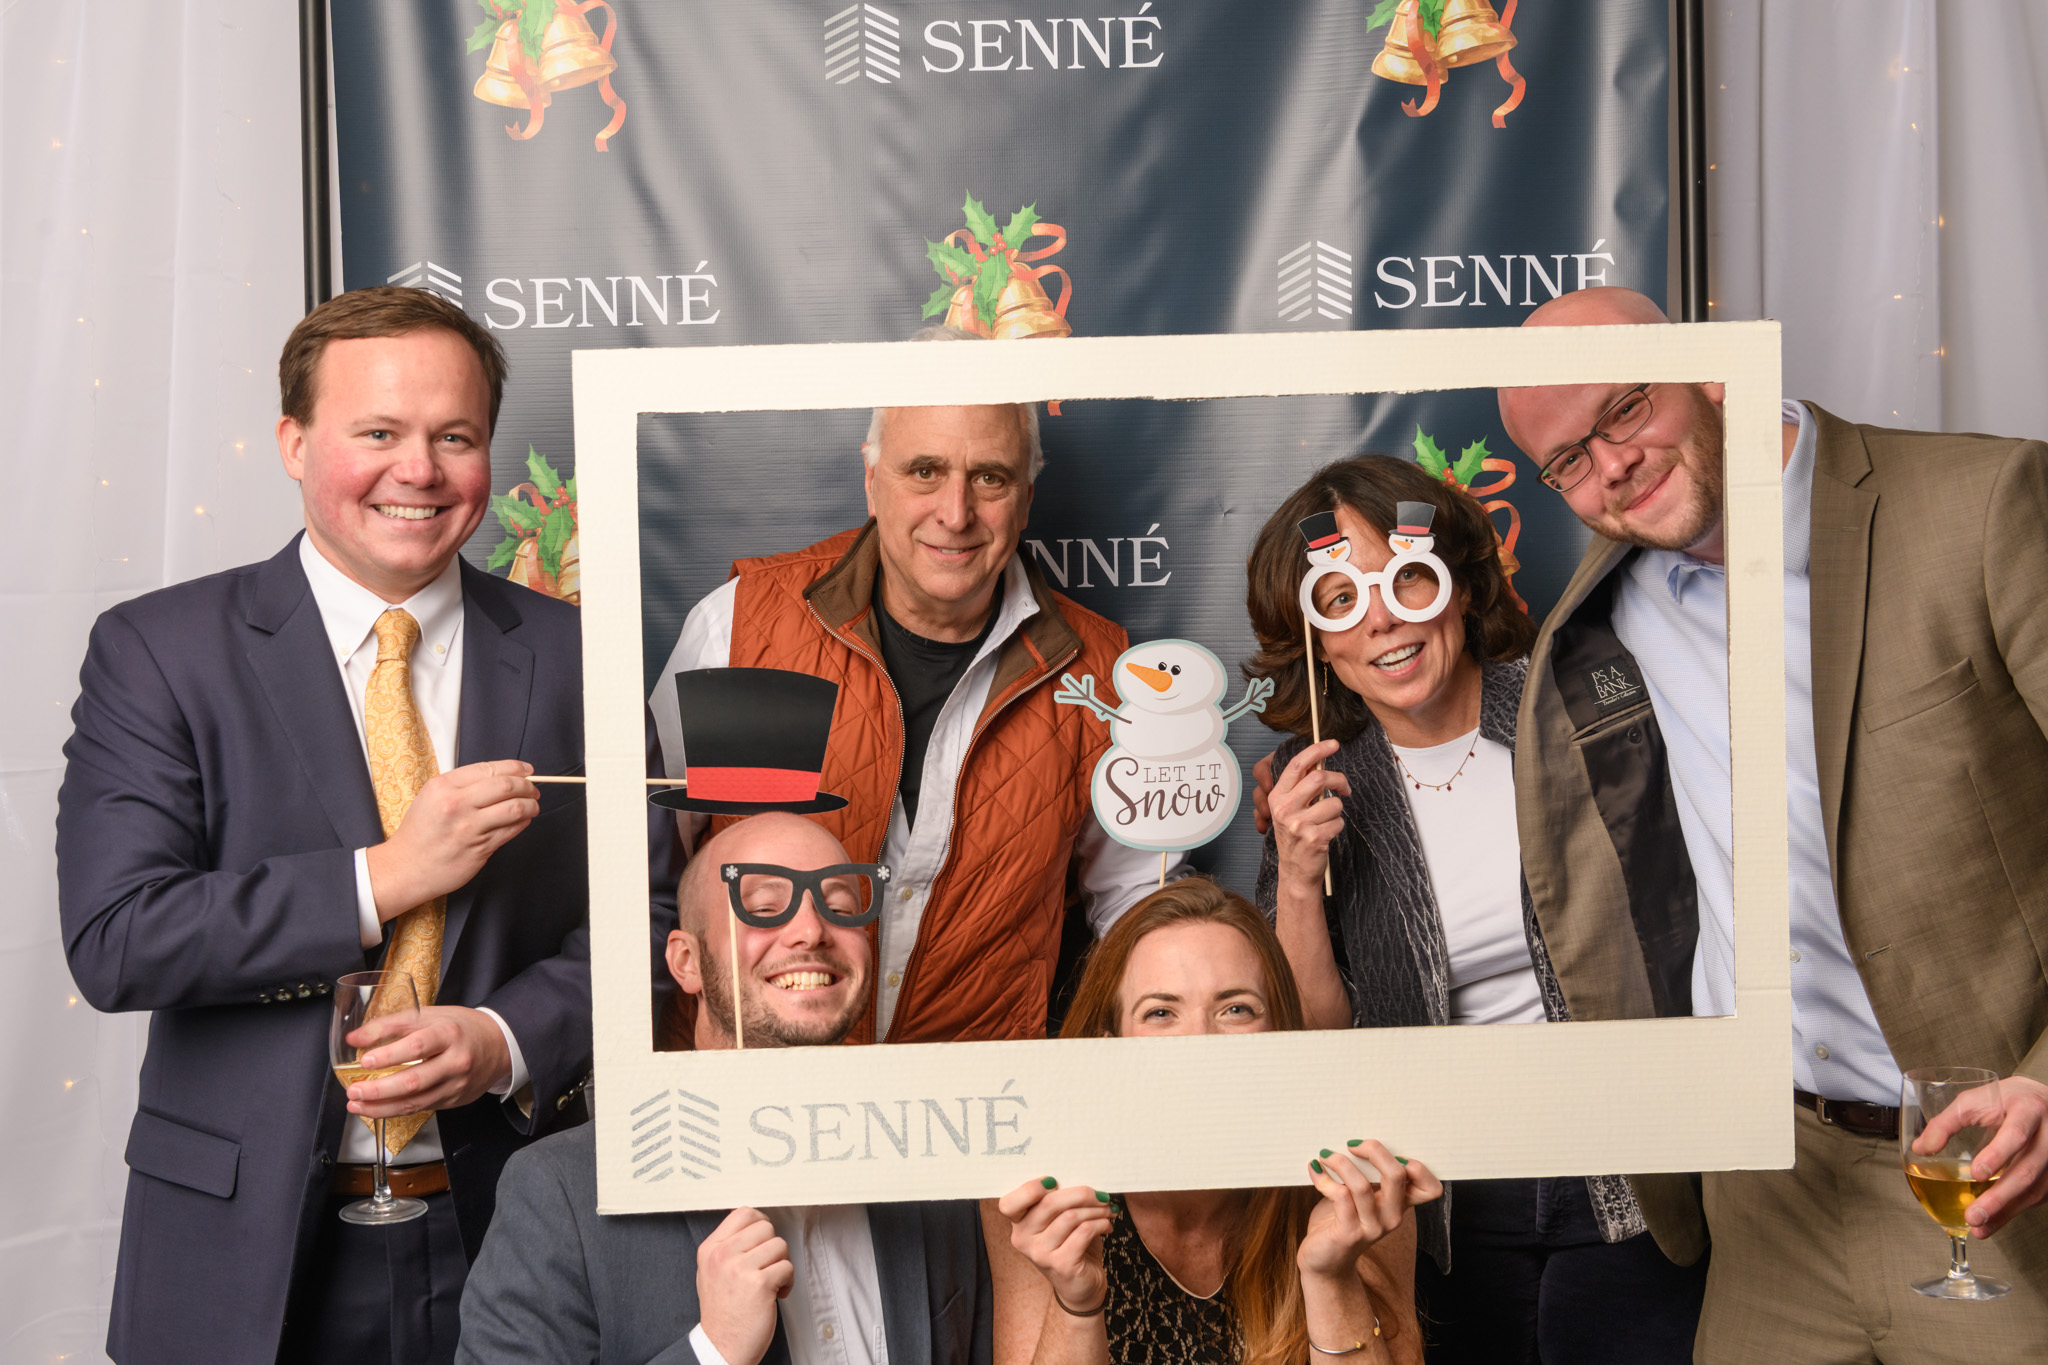 senne-winter-party-2018--0053.jpg